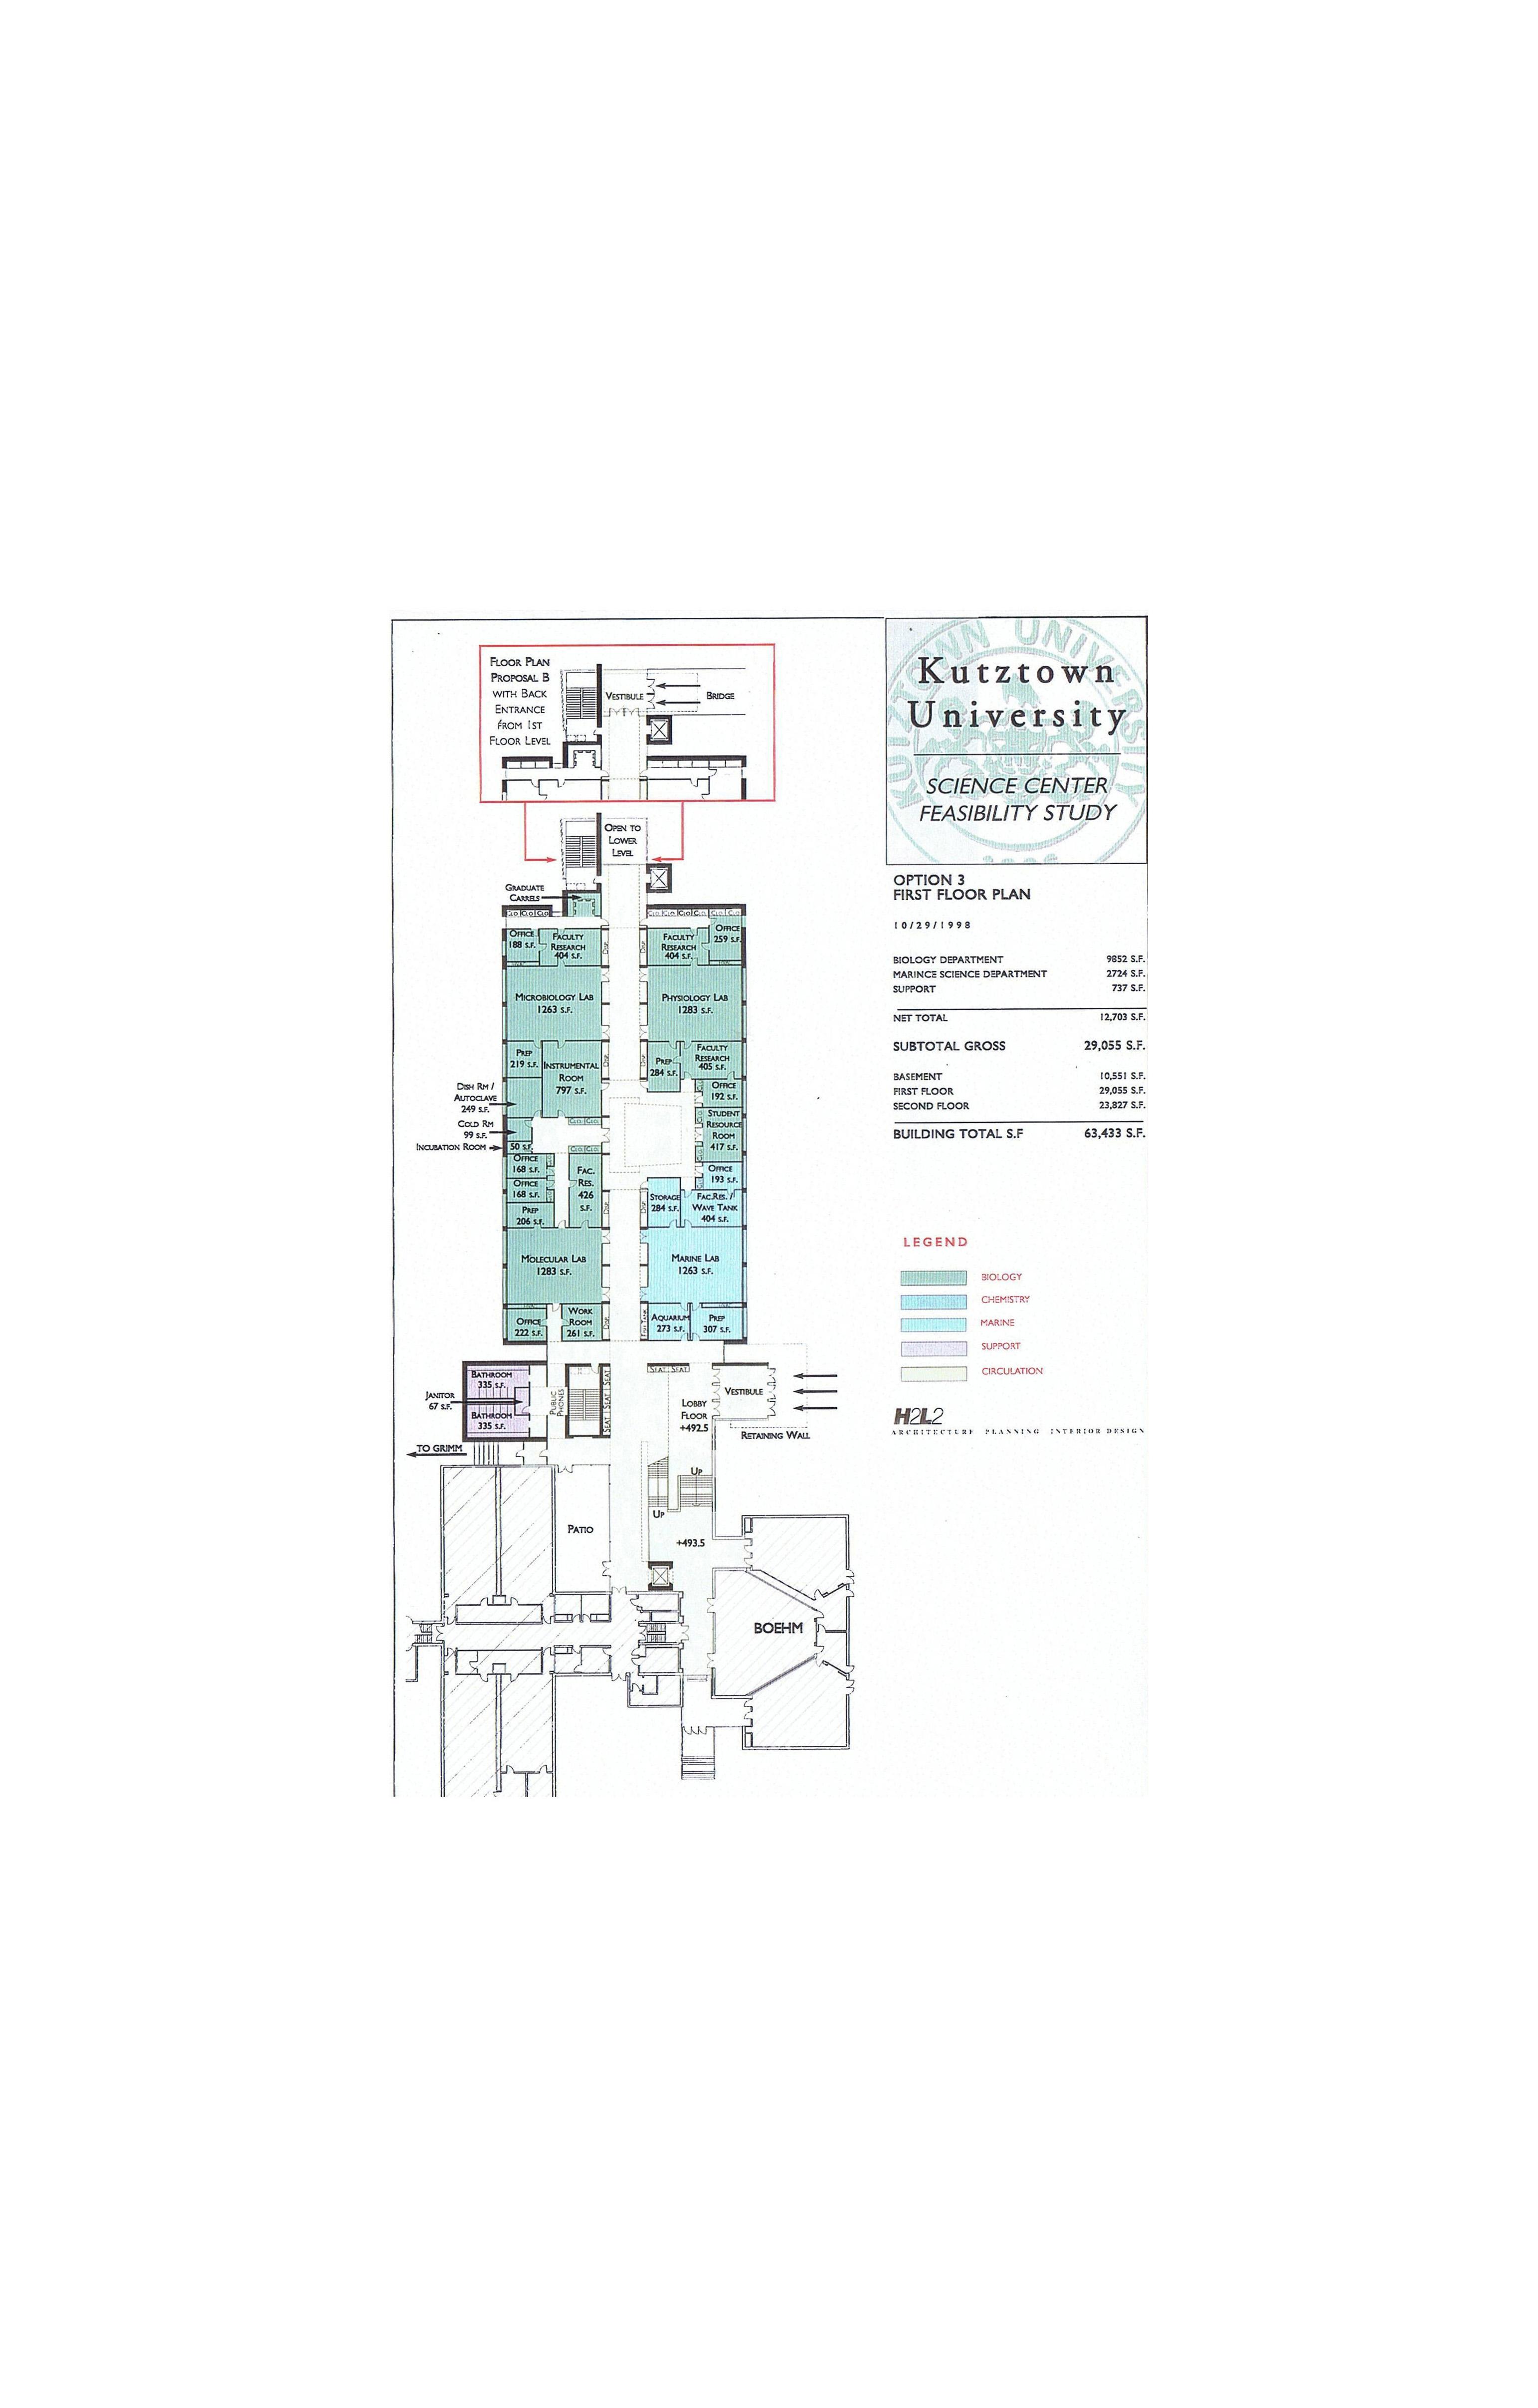 H2L2,(Feasibility Study) Kutztown University, Science